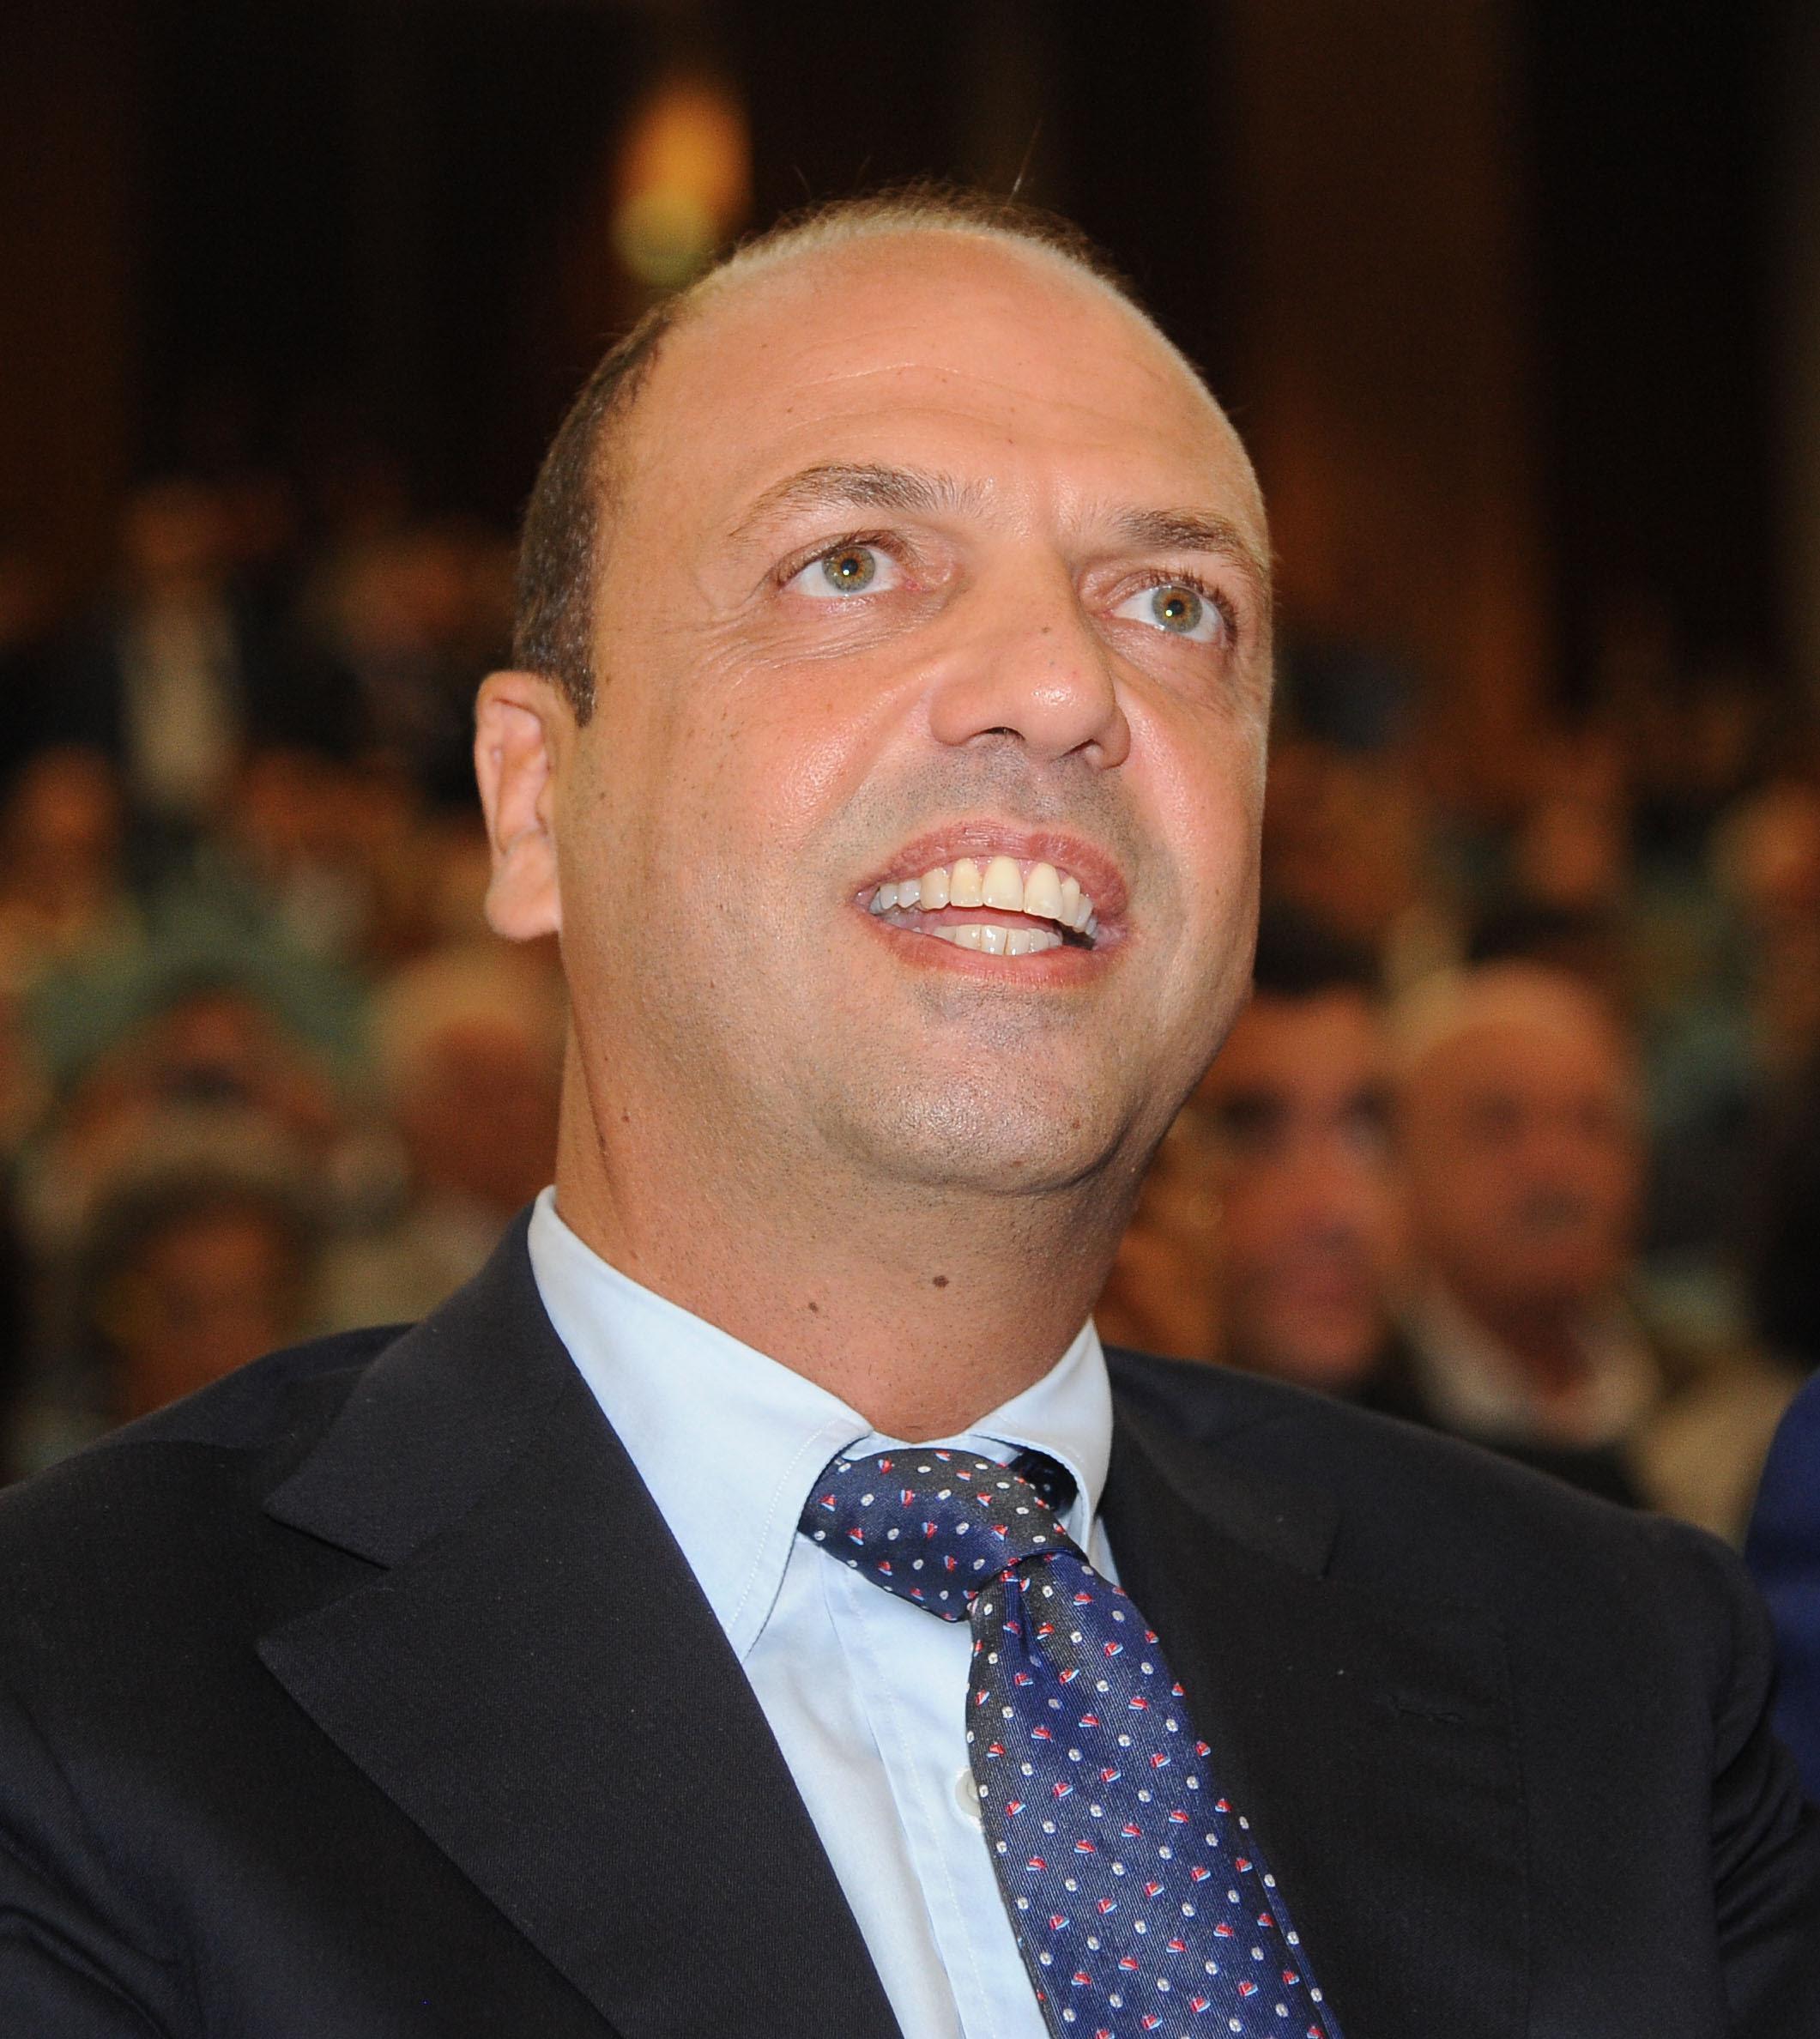 Angelino Alfano    segretario del Pdl